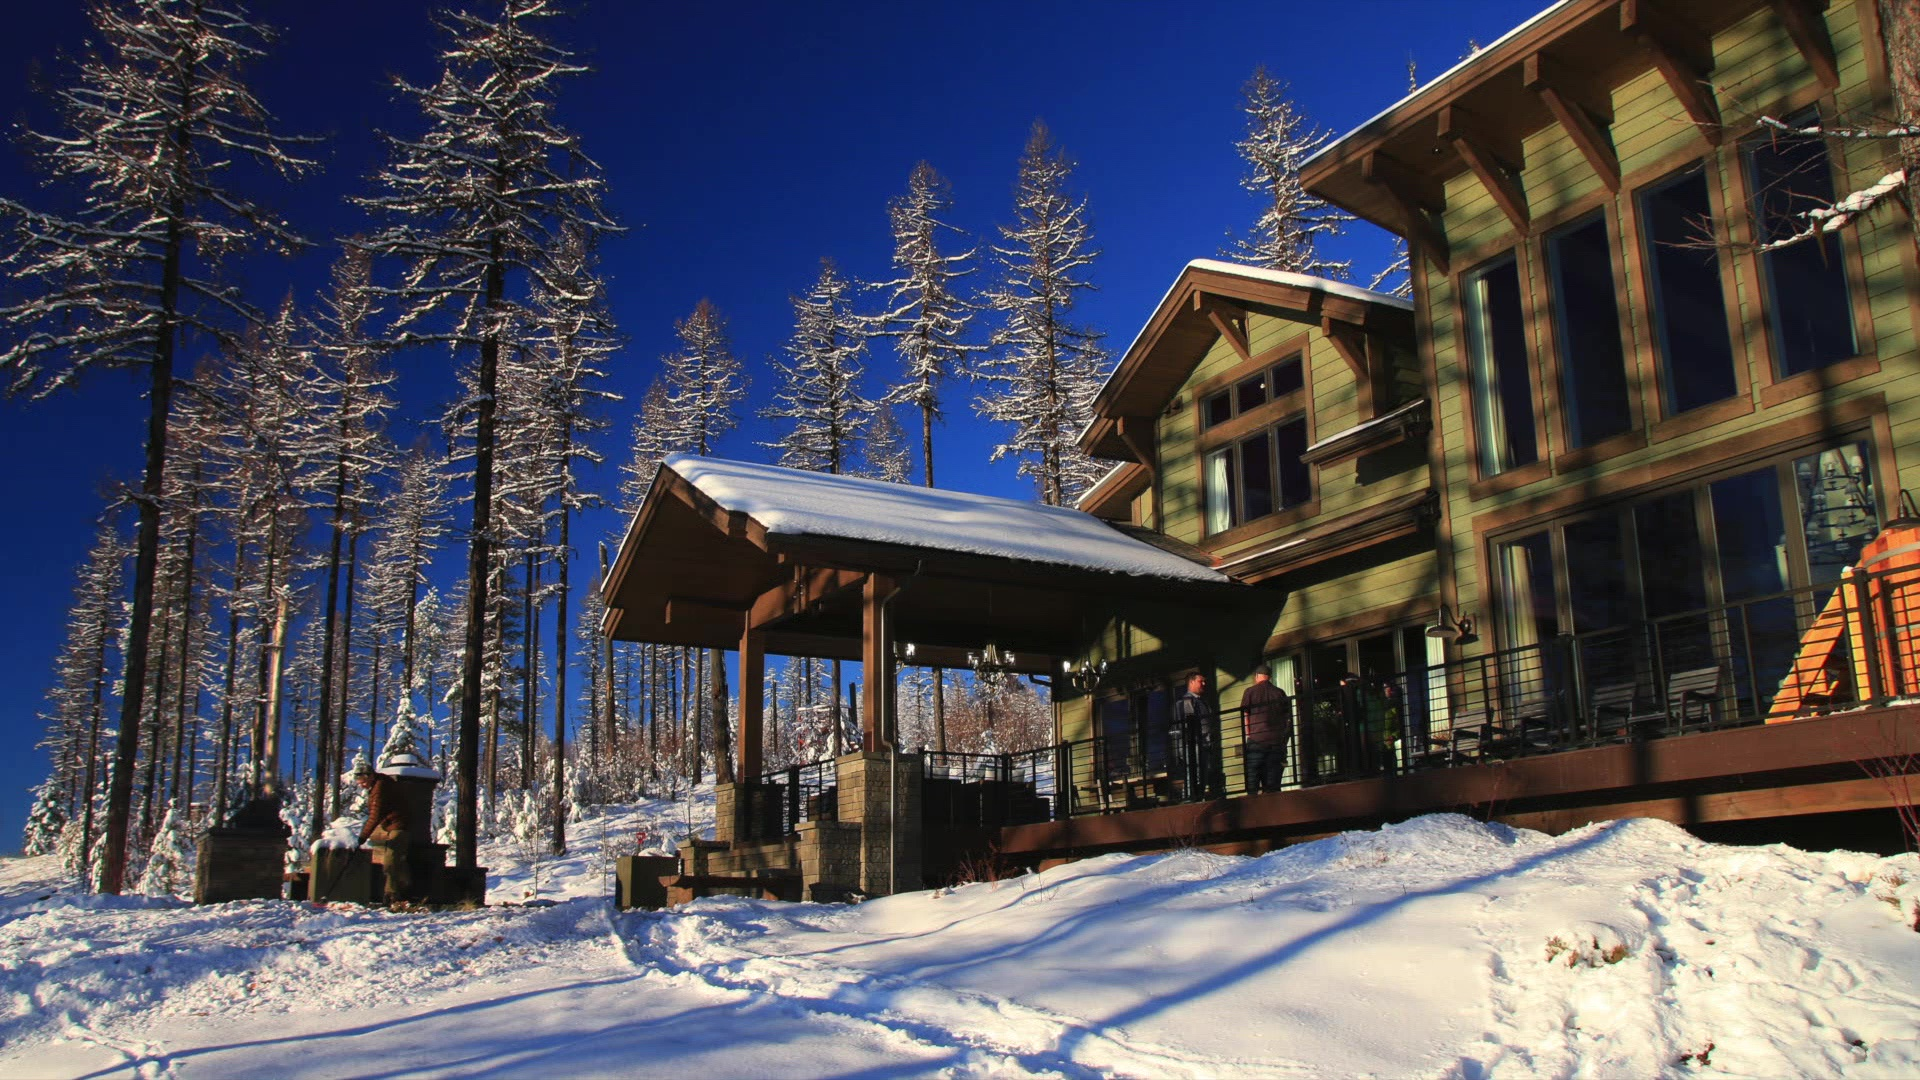 HGTV Dream Home in Whitefish